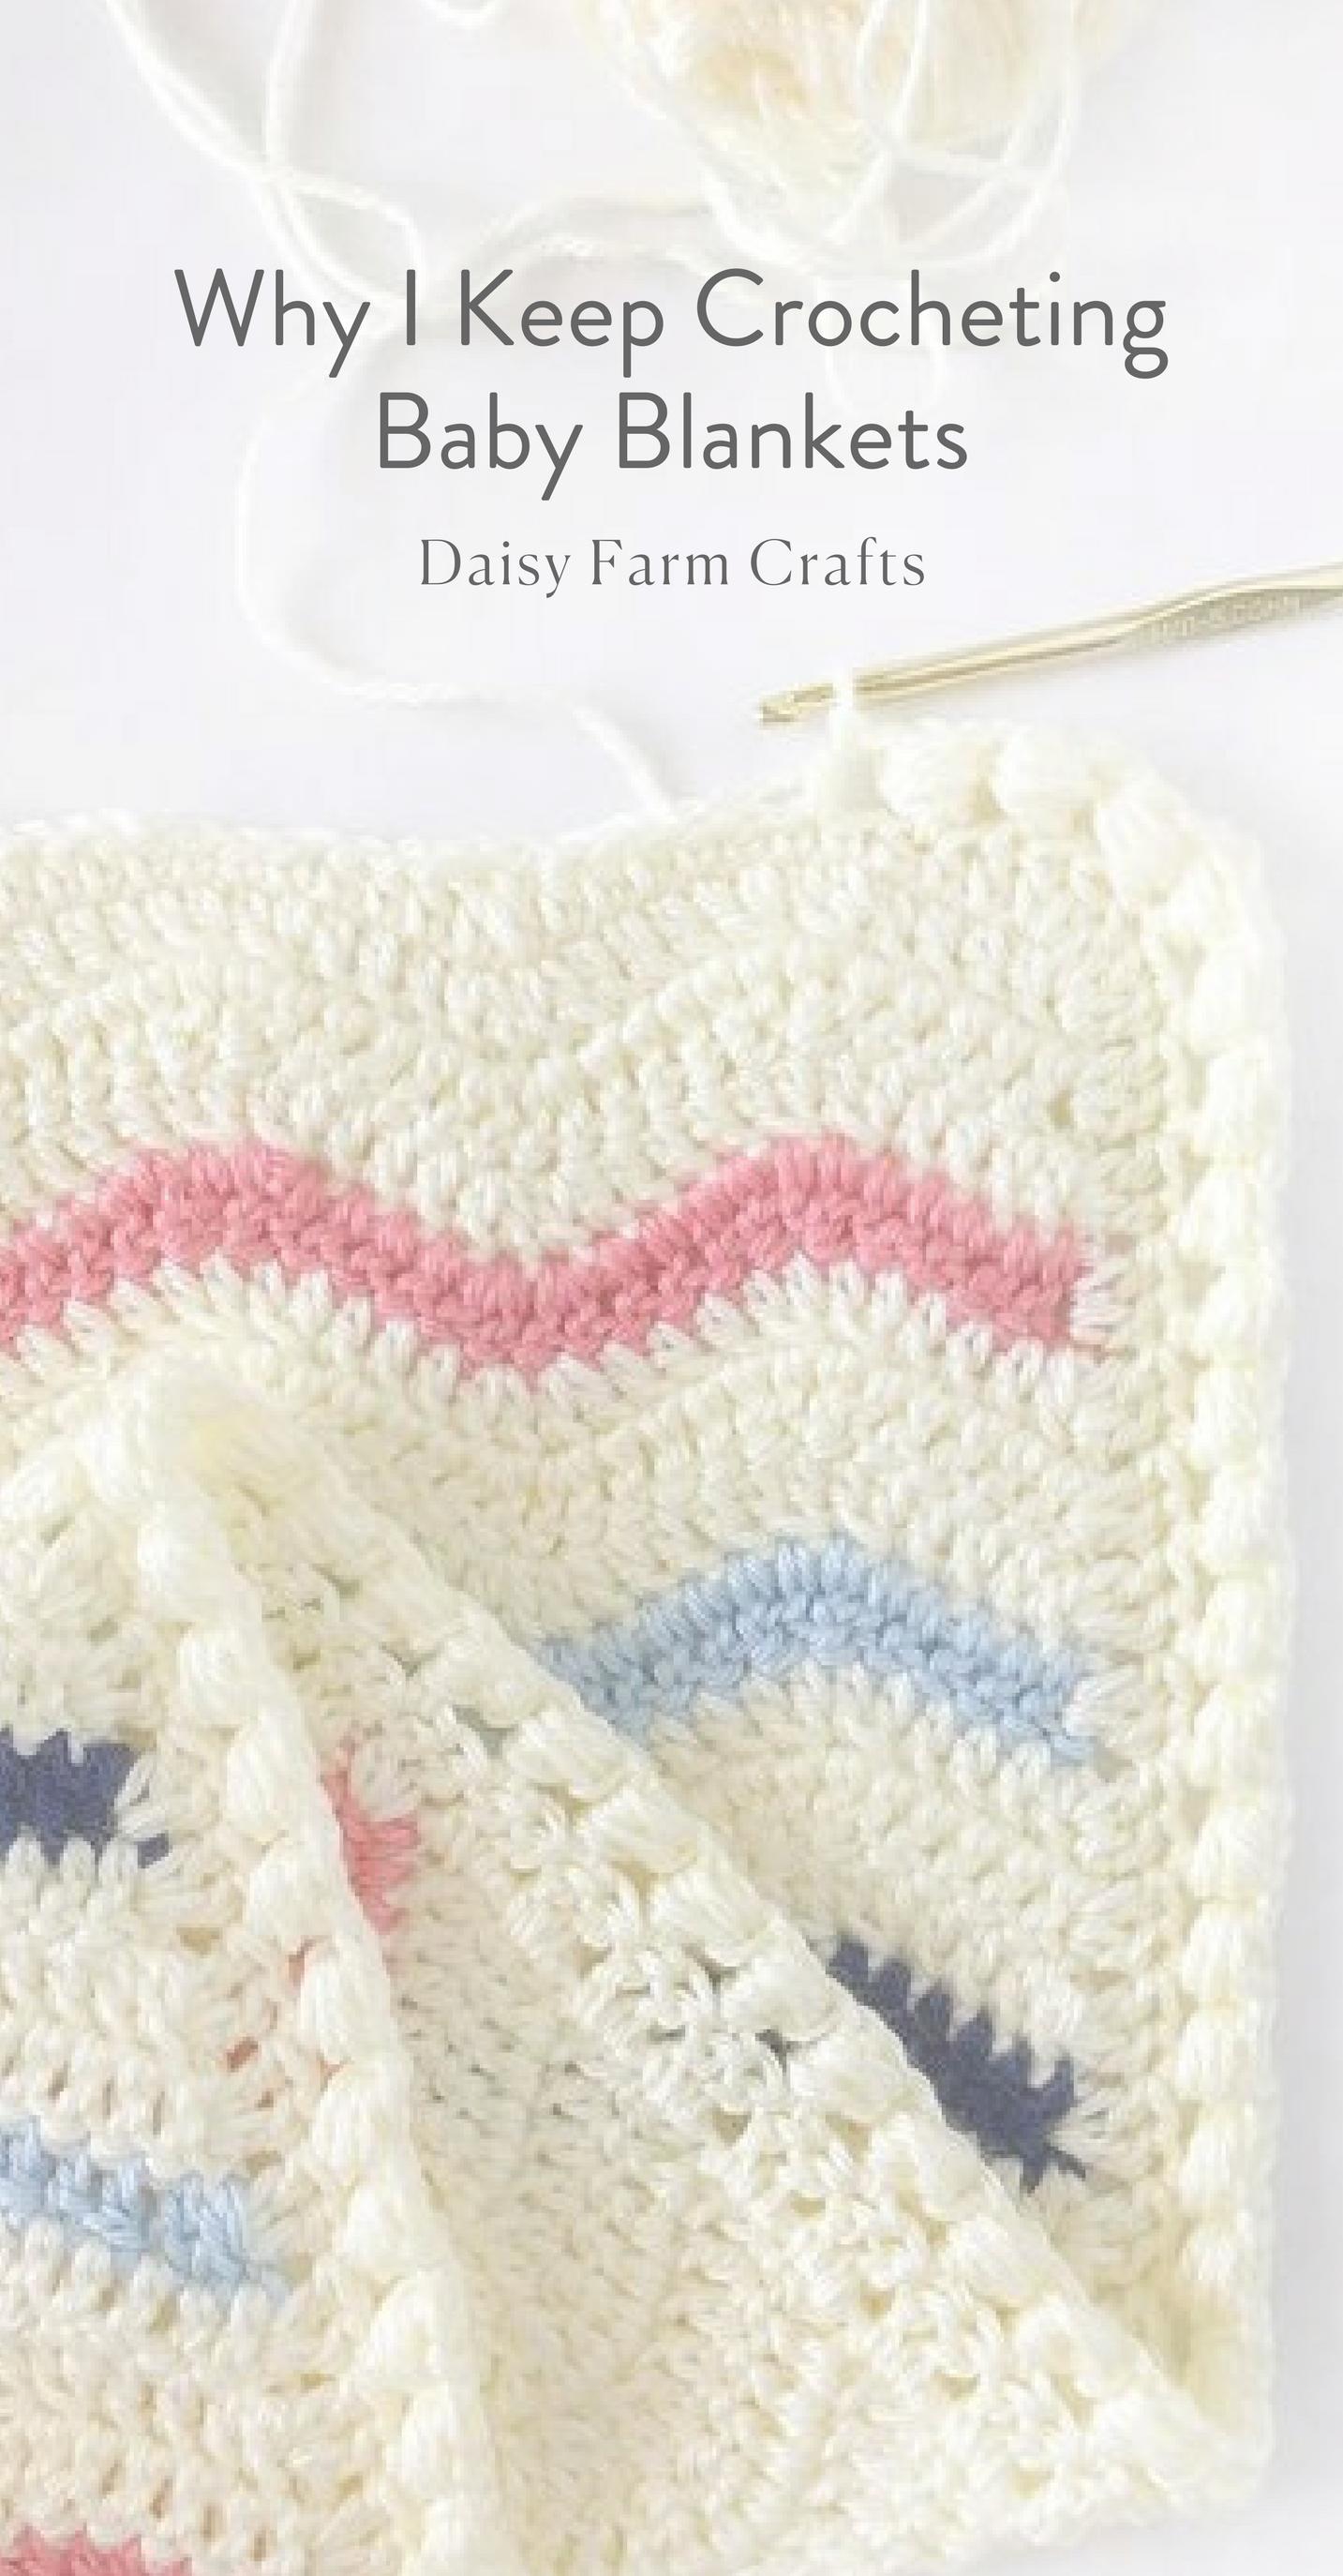 Why I Keep Crocheting Baby Blankets - Daisy Farm Crafts Blog ...